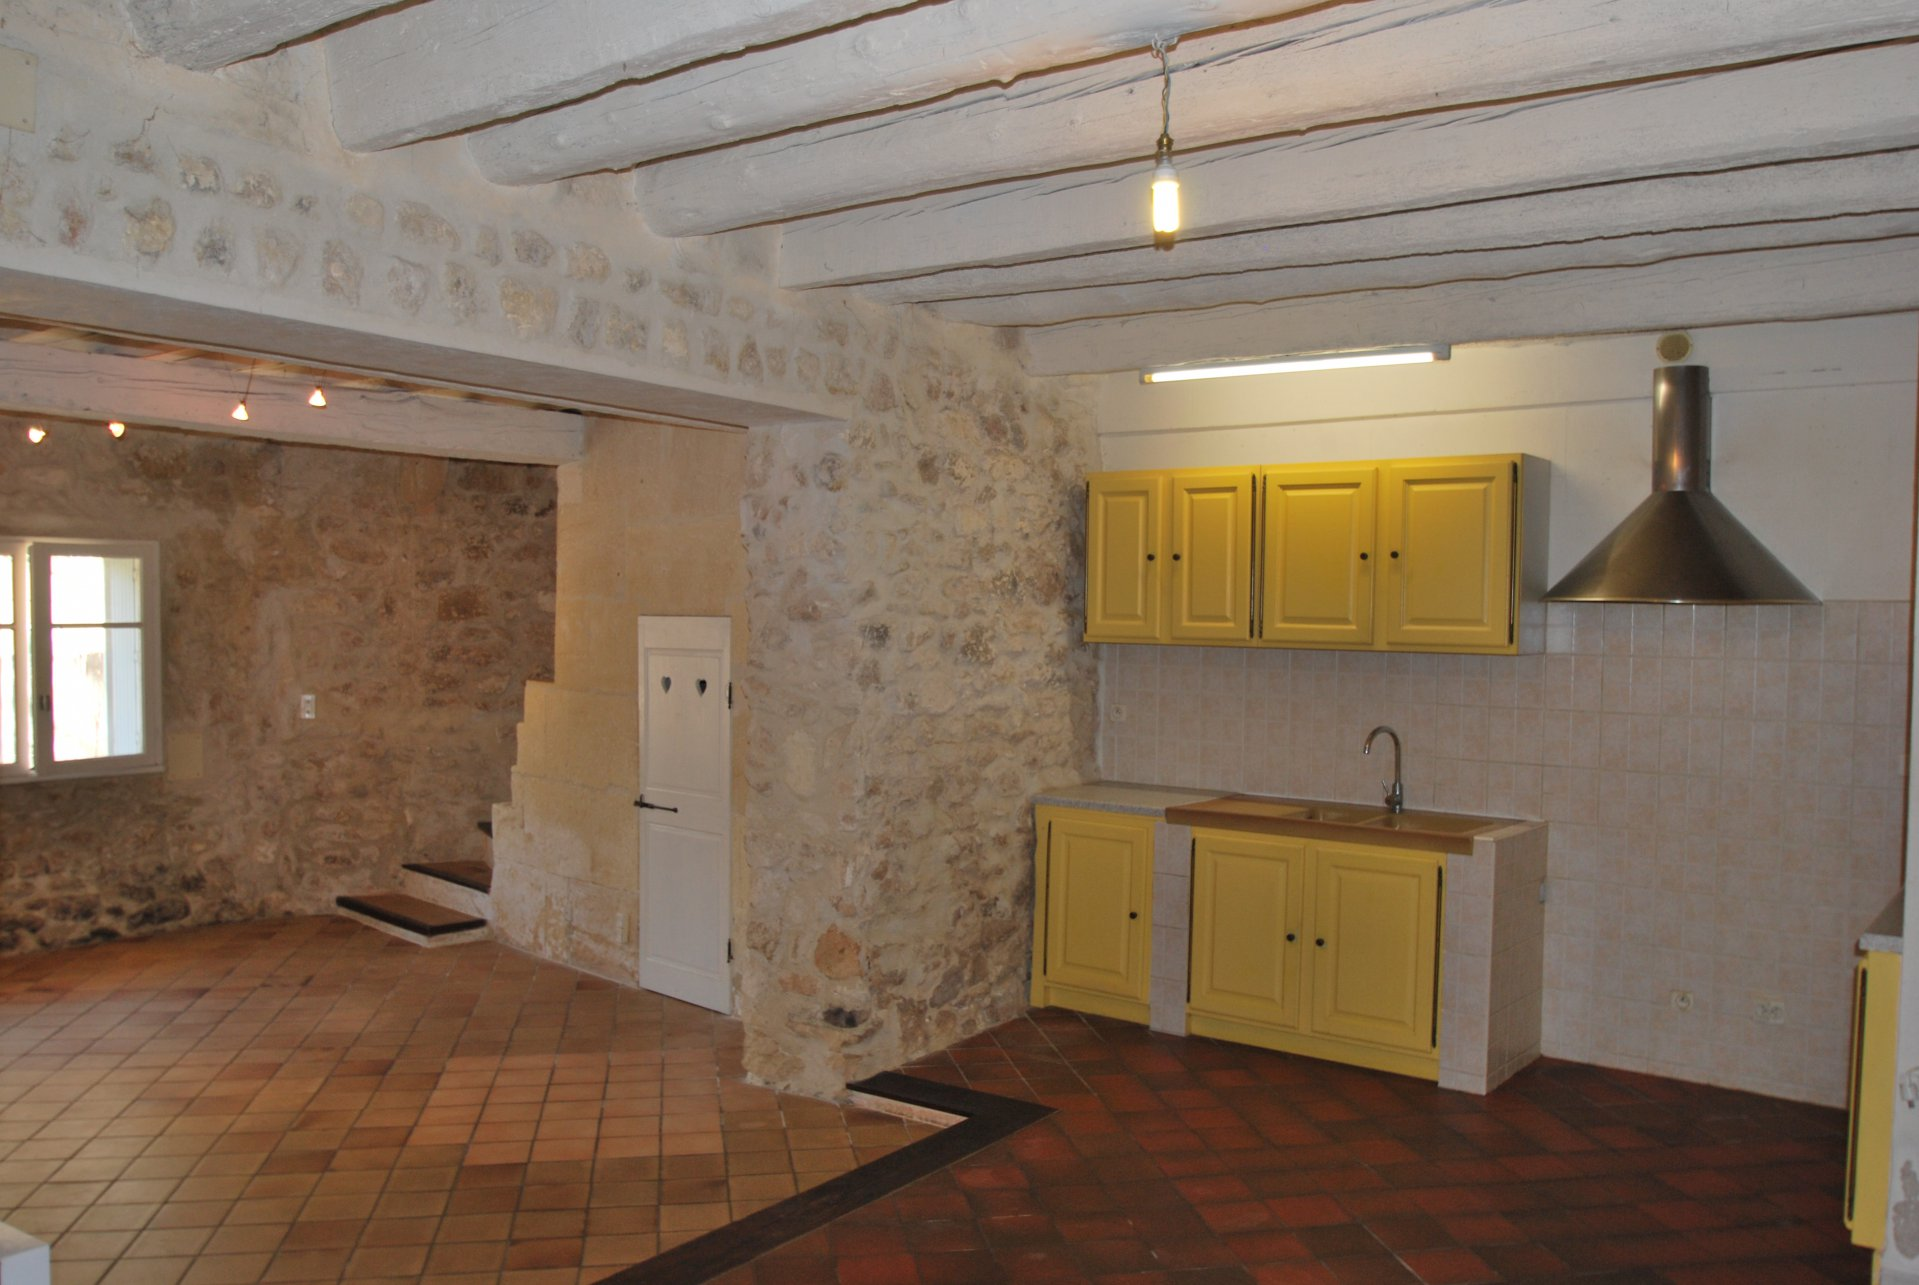 Kitchen, stainless steel, natural light, tile